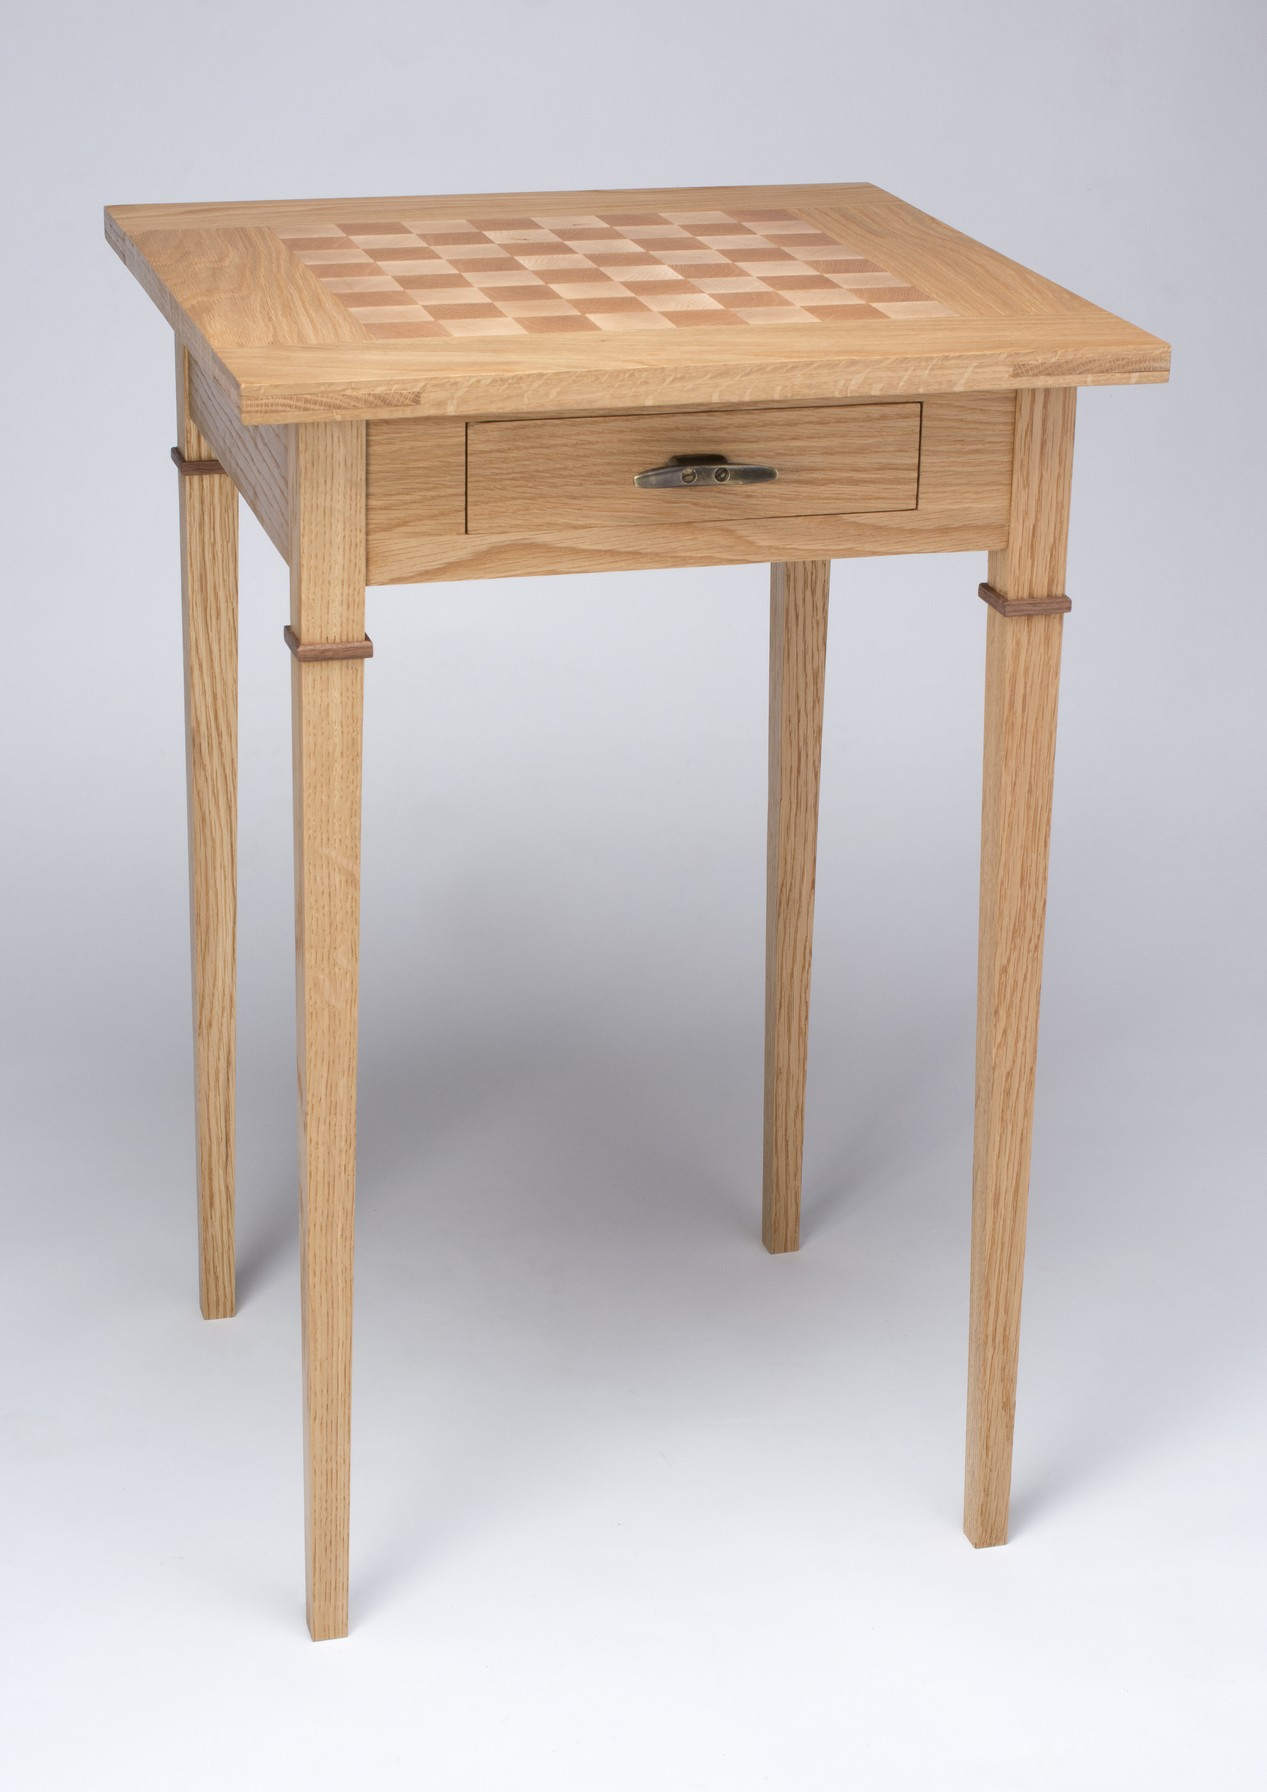 Artisan Designed Chess Table